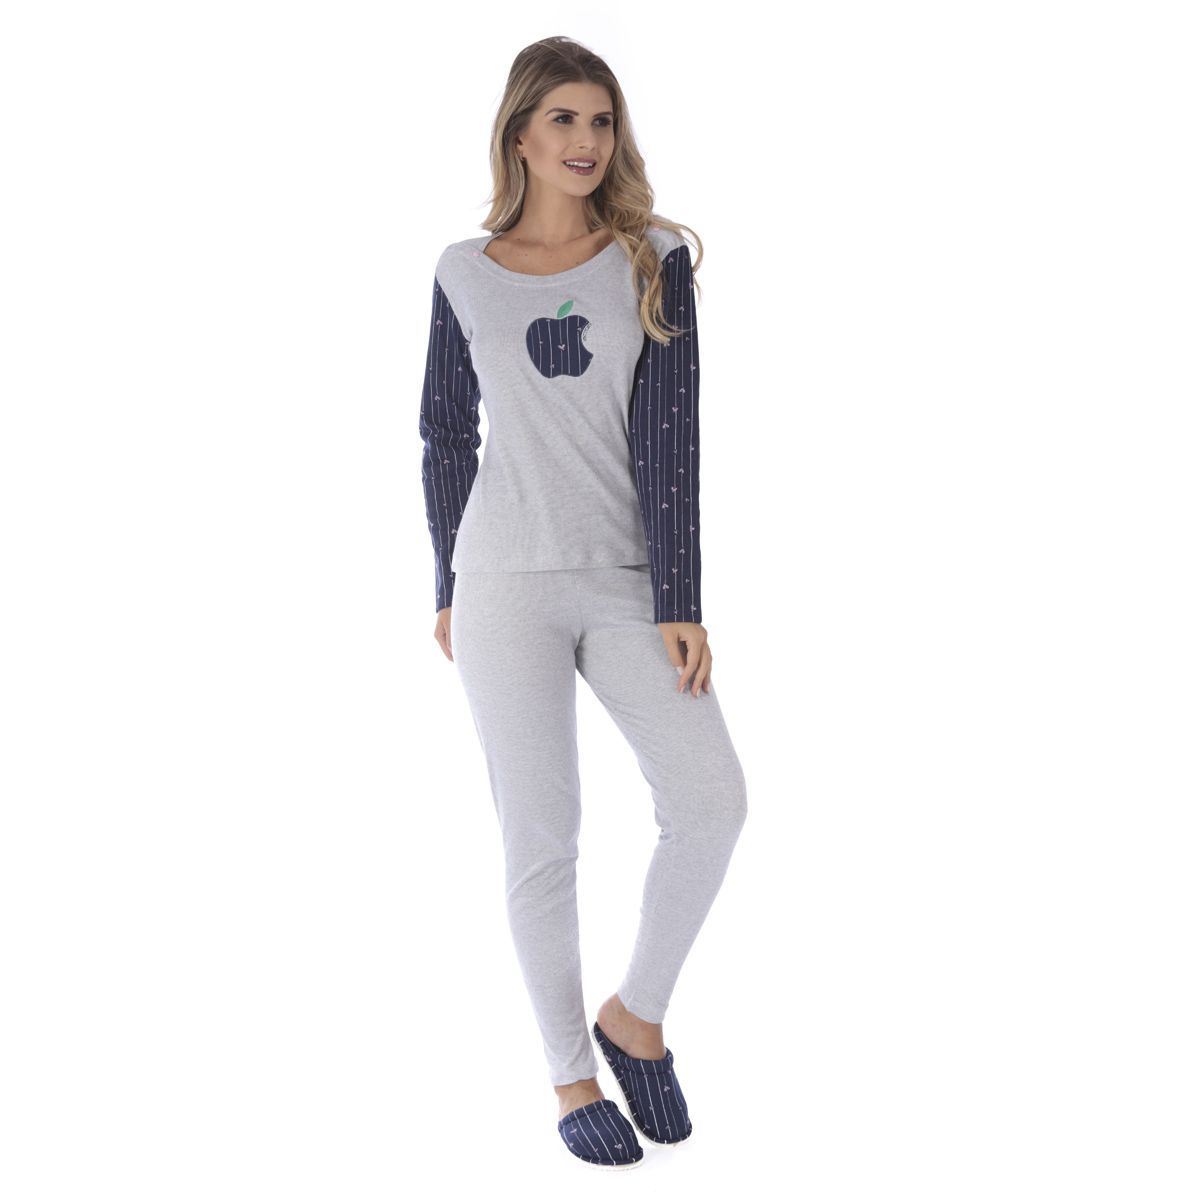 Pijama de inverno feminino SLIM Victory